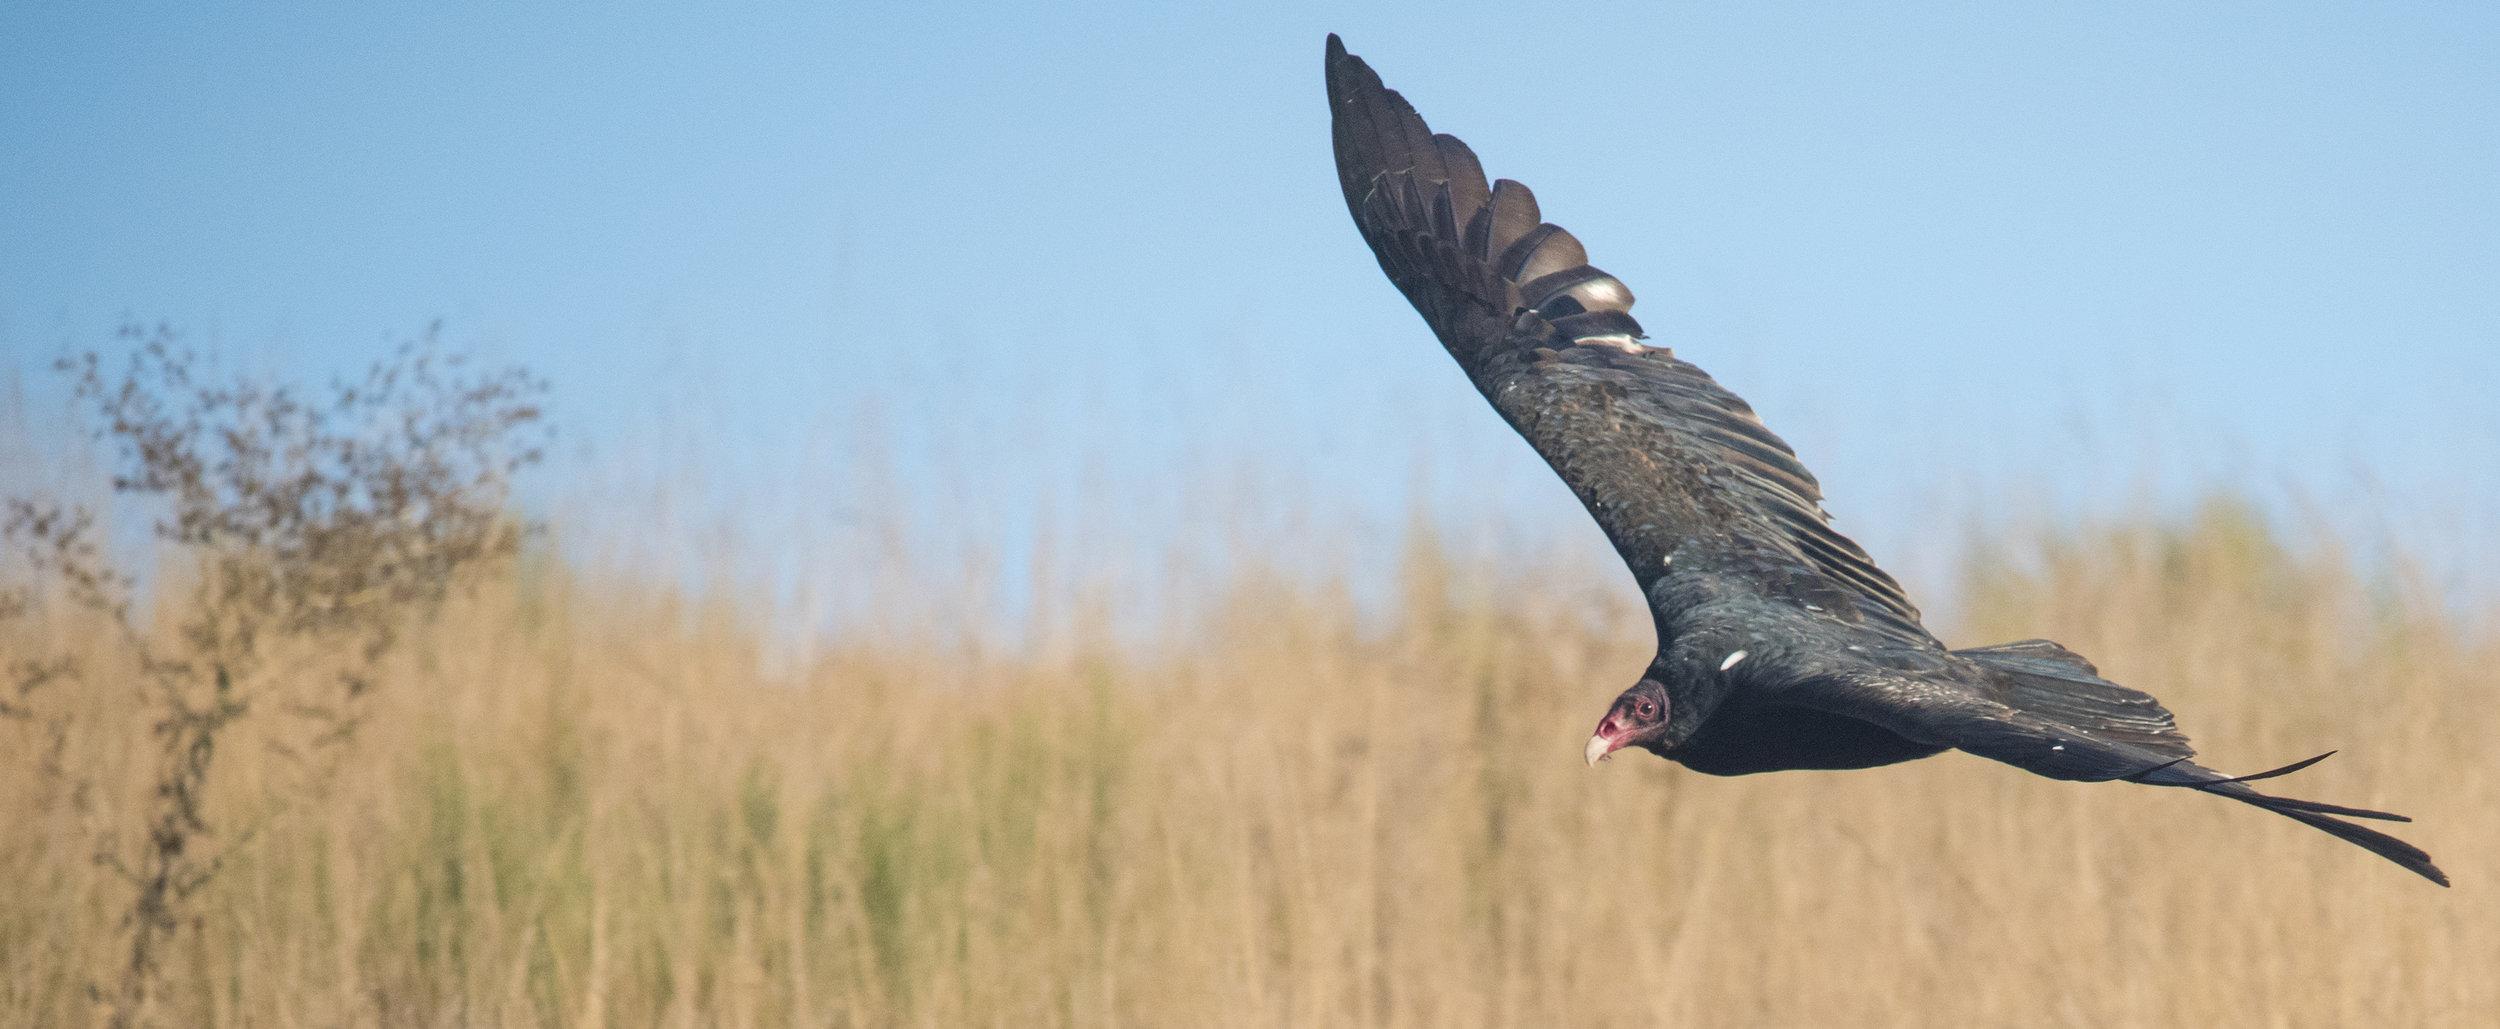 Turkey Vulture at Baylands Nature Preserve, Palo Alto, California